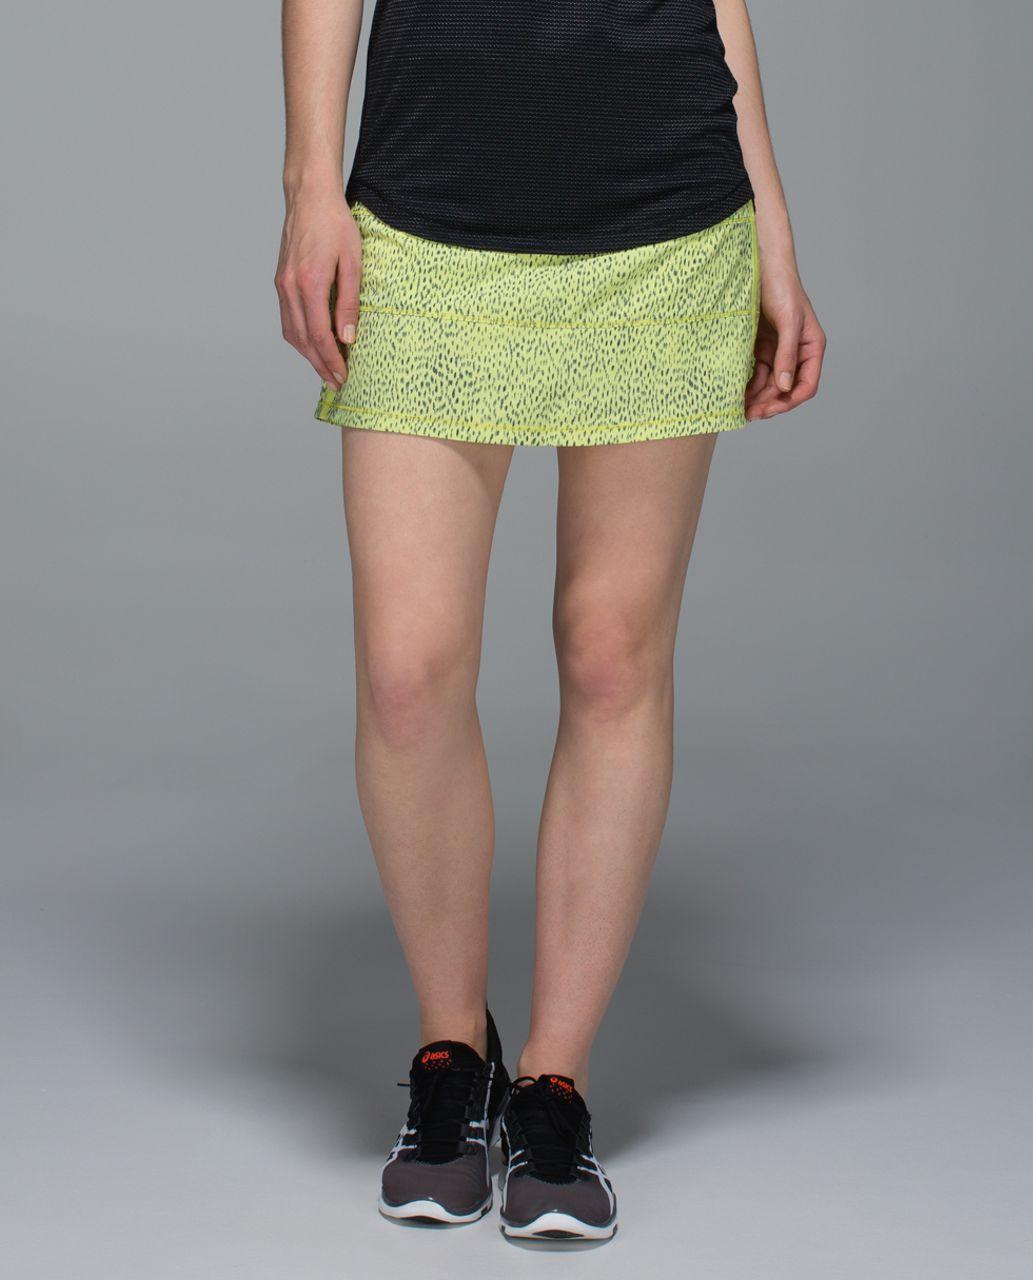 Lululemon Pace Rival Skirt II *4-way Stretch (Tall) - Dottie Dash Clarity Yellow Black / Clarity Yellow